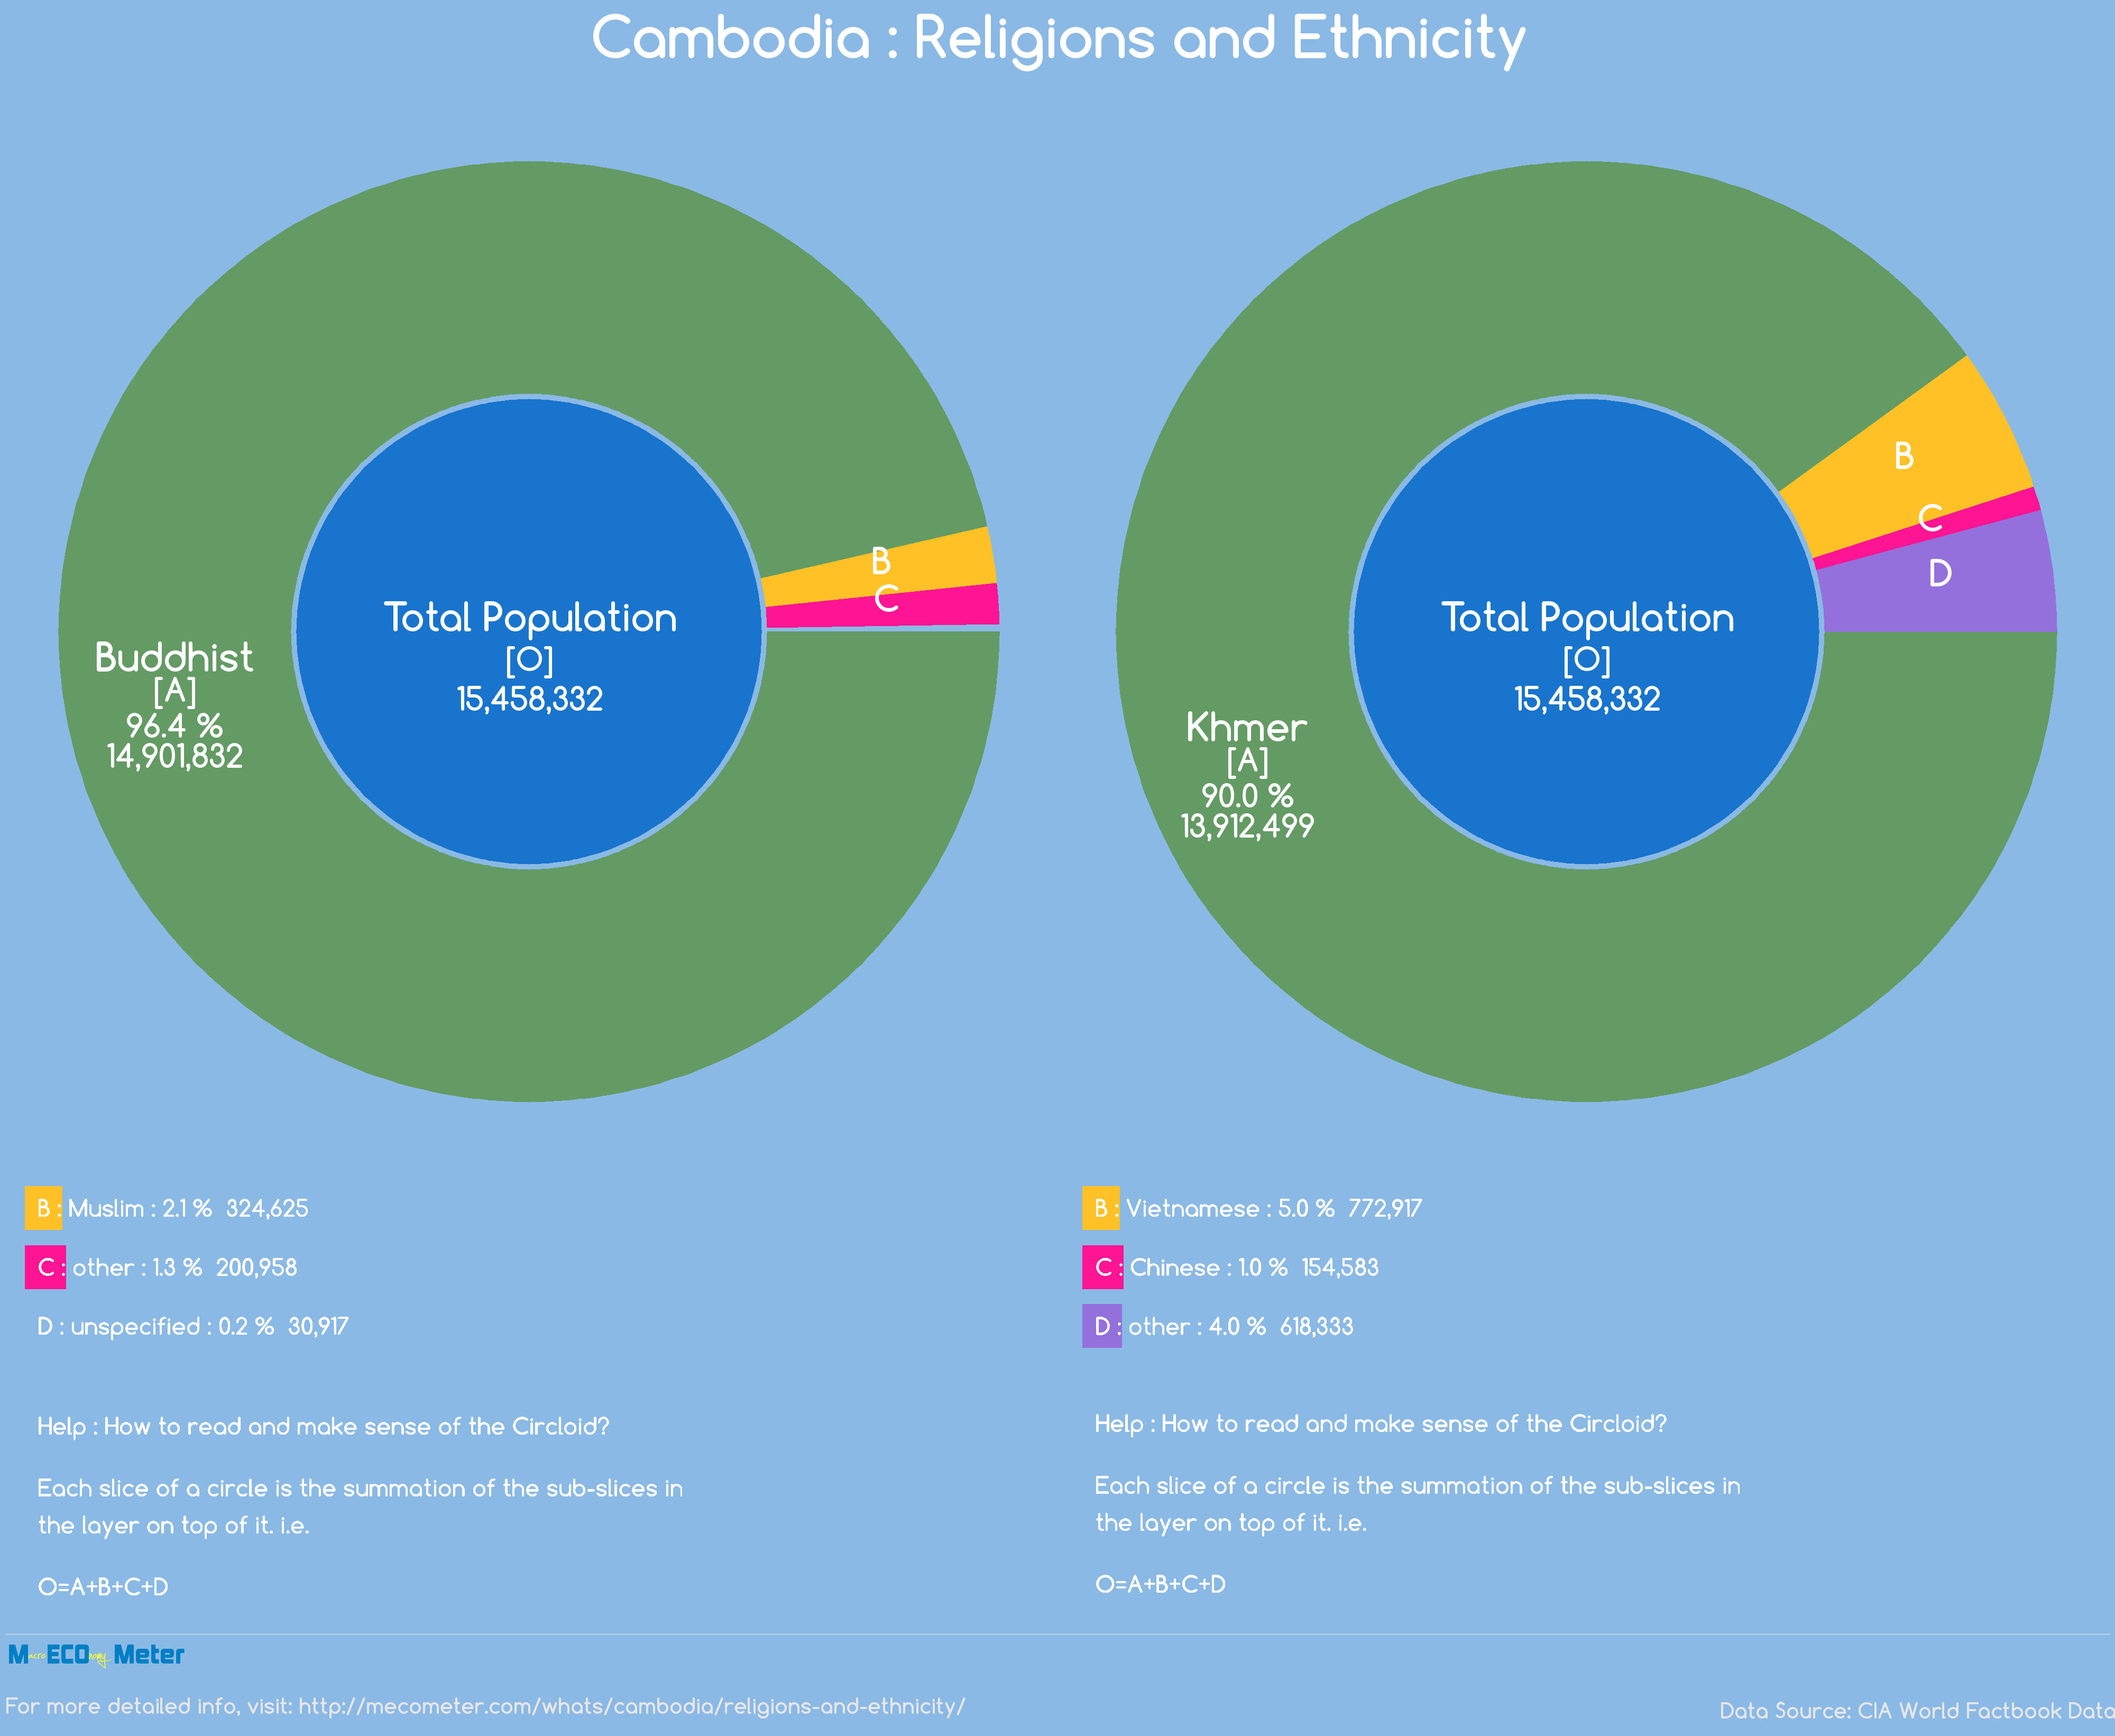 Cambodia : Religions and Ethnicity